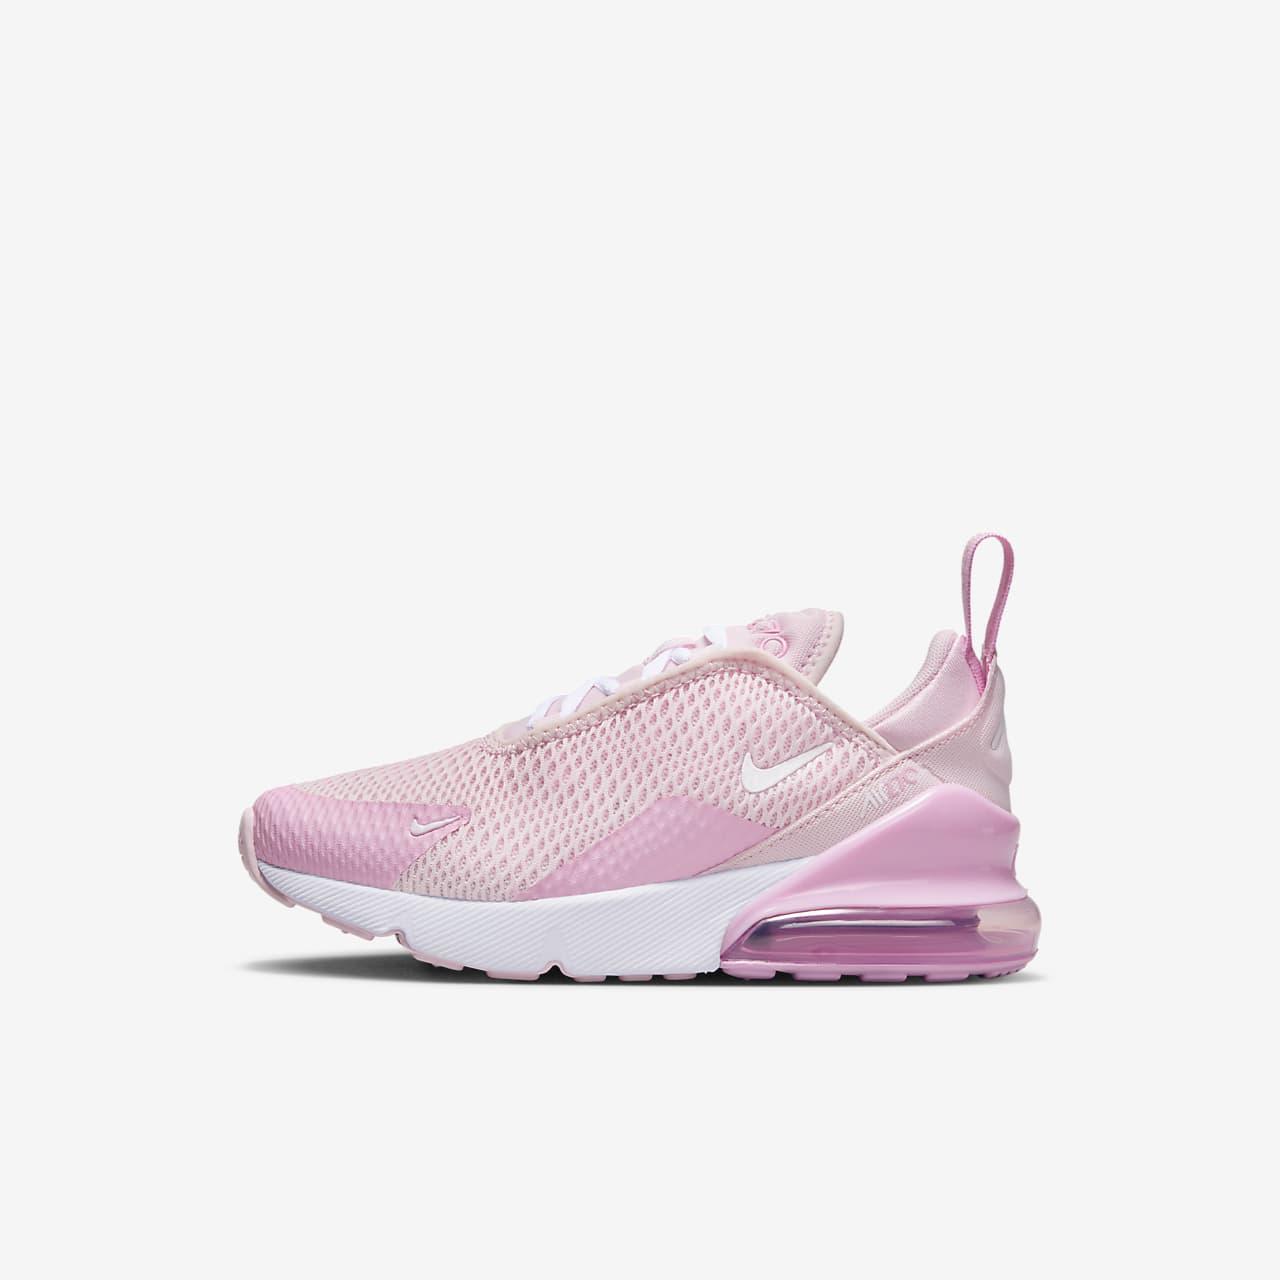 Nike Sneaker aus Mesh Modell 'Air Max 270' Schwarz